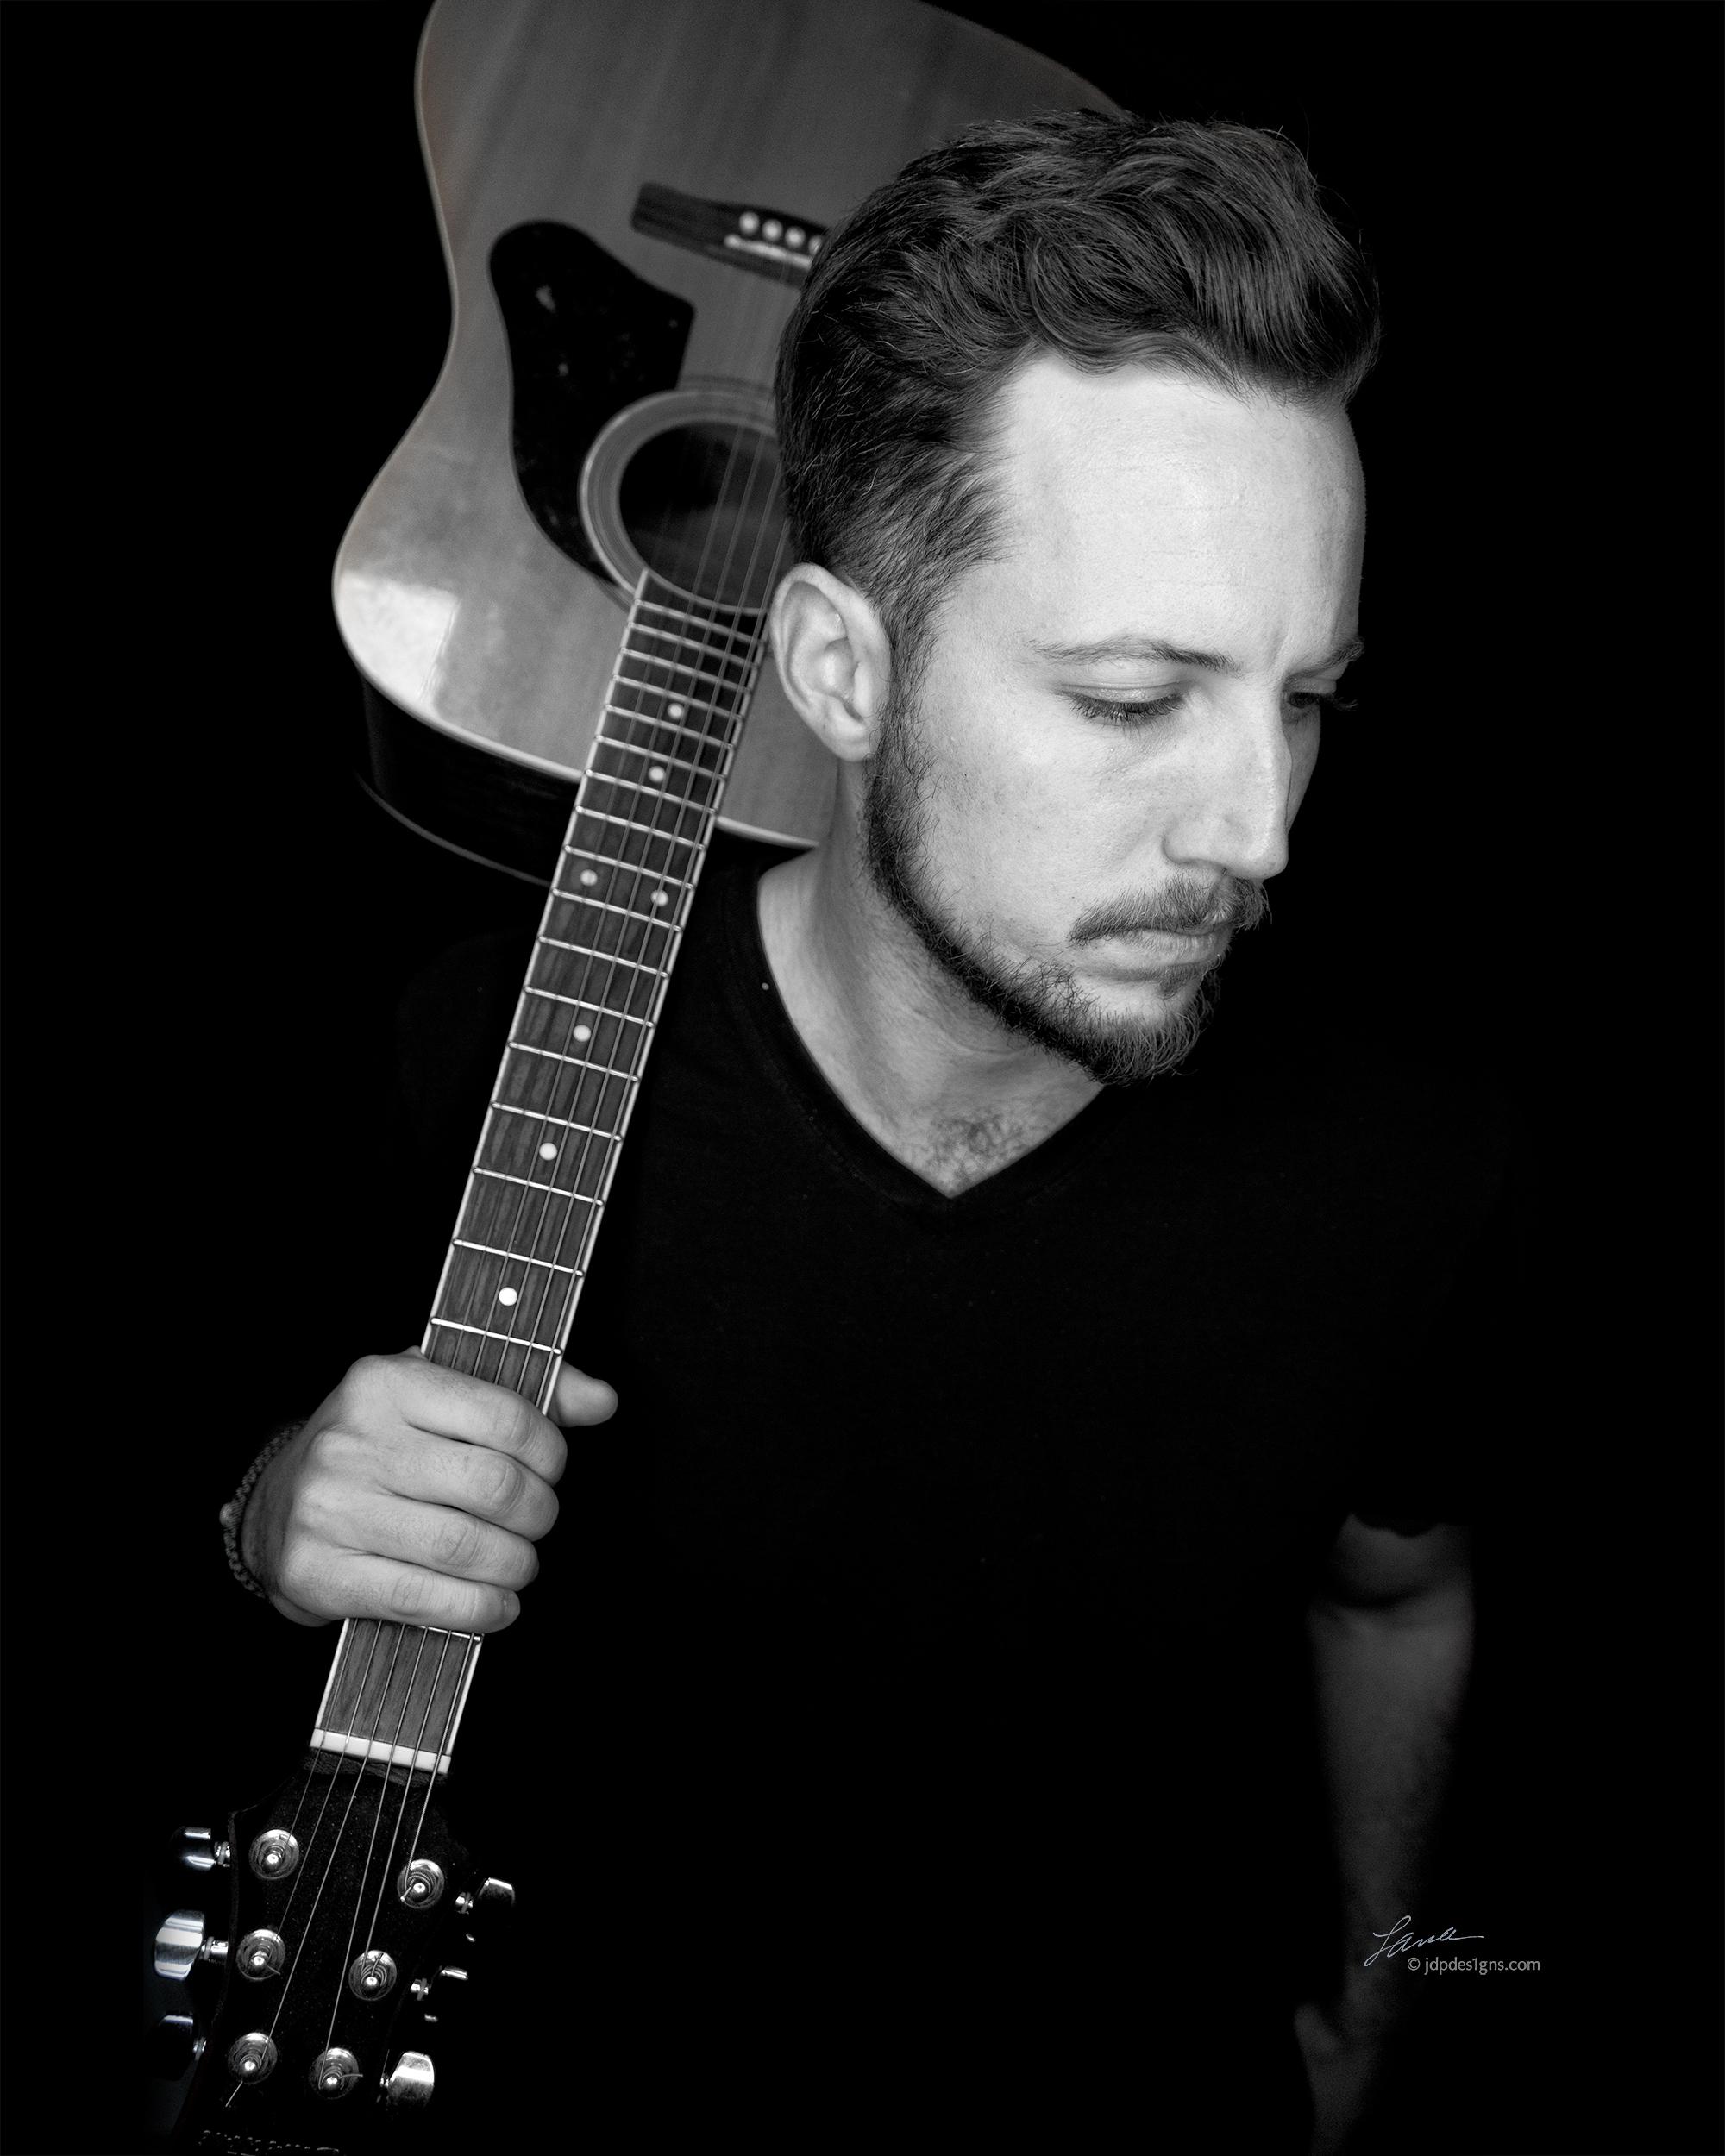 Jake Guitar 1 bw.jpg